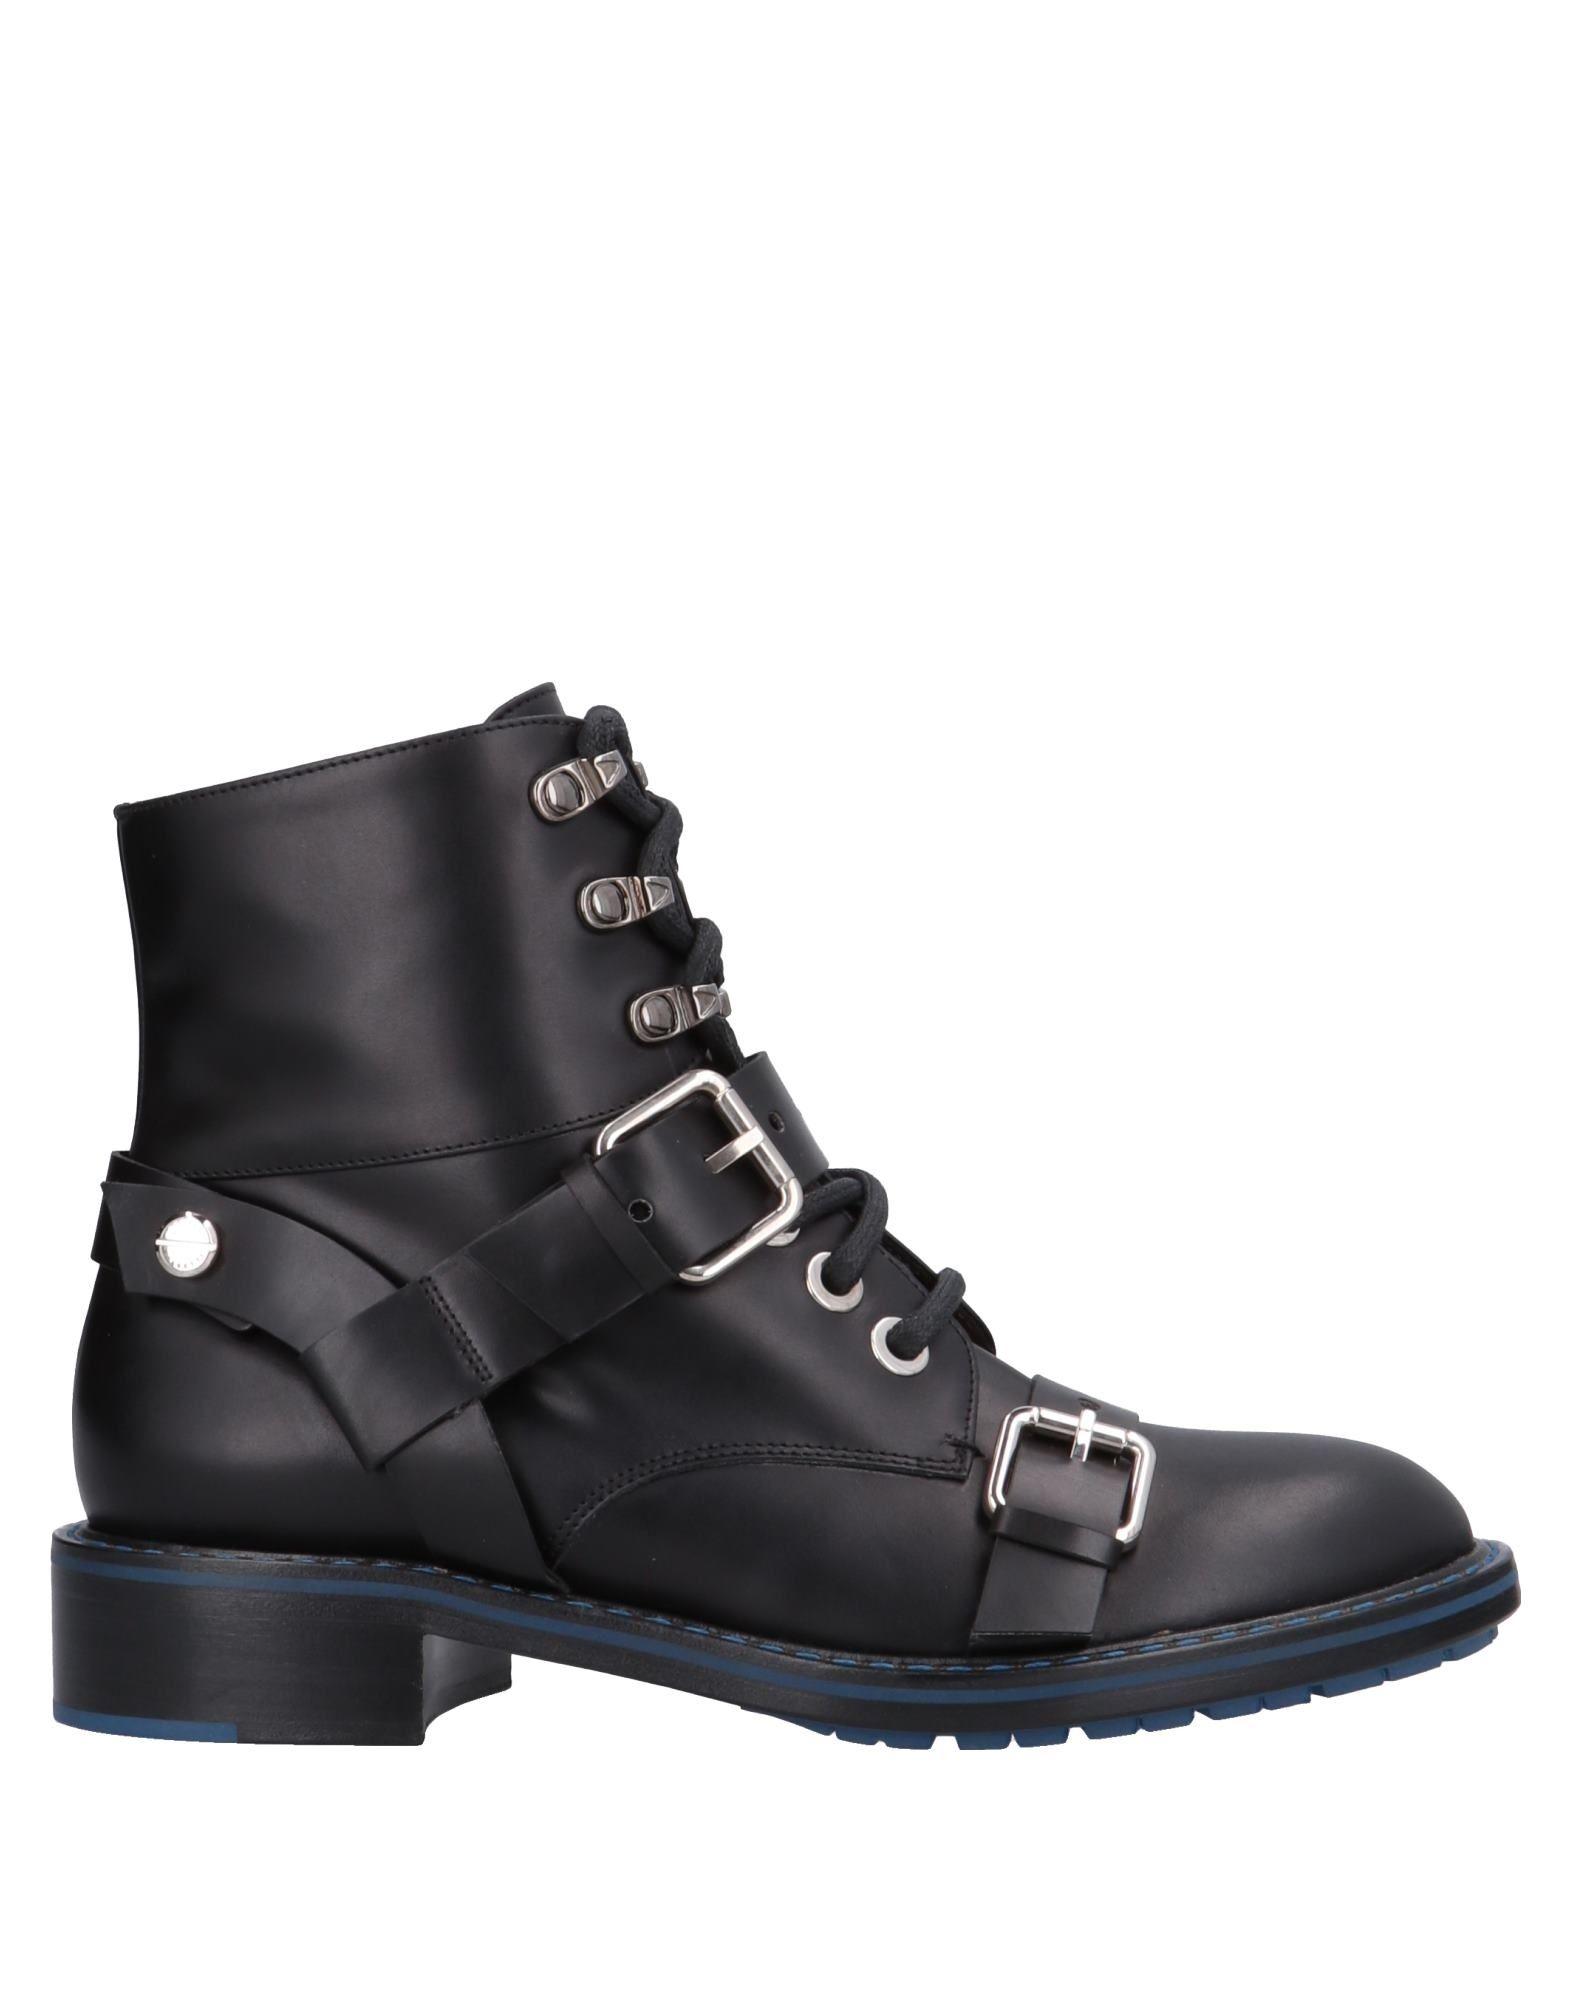 Fratelli Rossetti Stiefelette Damen  11550538KJGünstige gut aussehende Schuhe